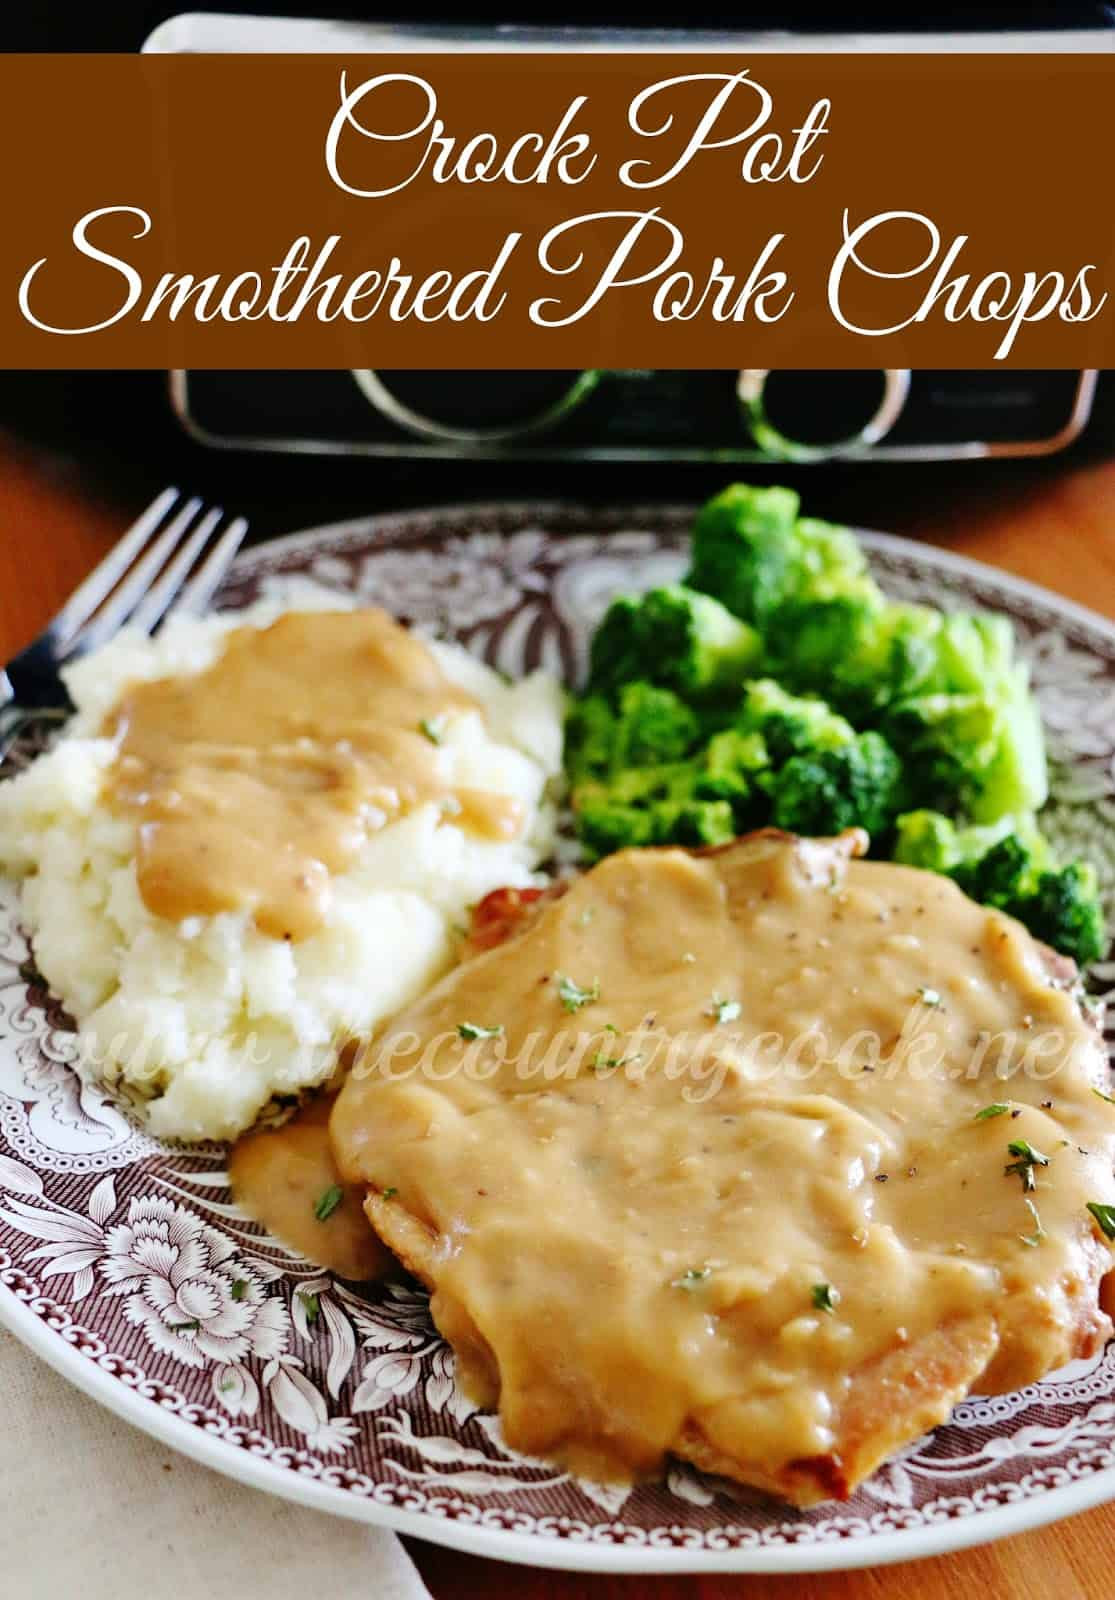 Pork Chops In A Crock Pot  Crock Pot Smothered Pork Chops The Country Cook